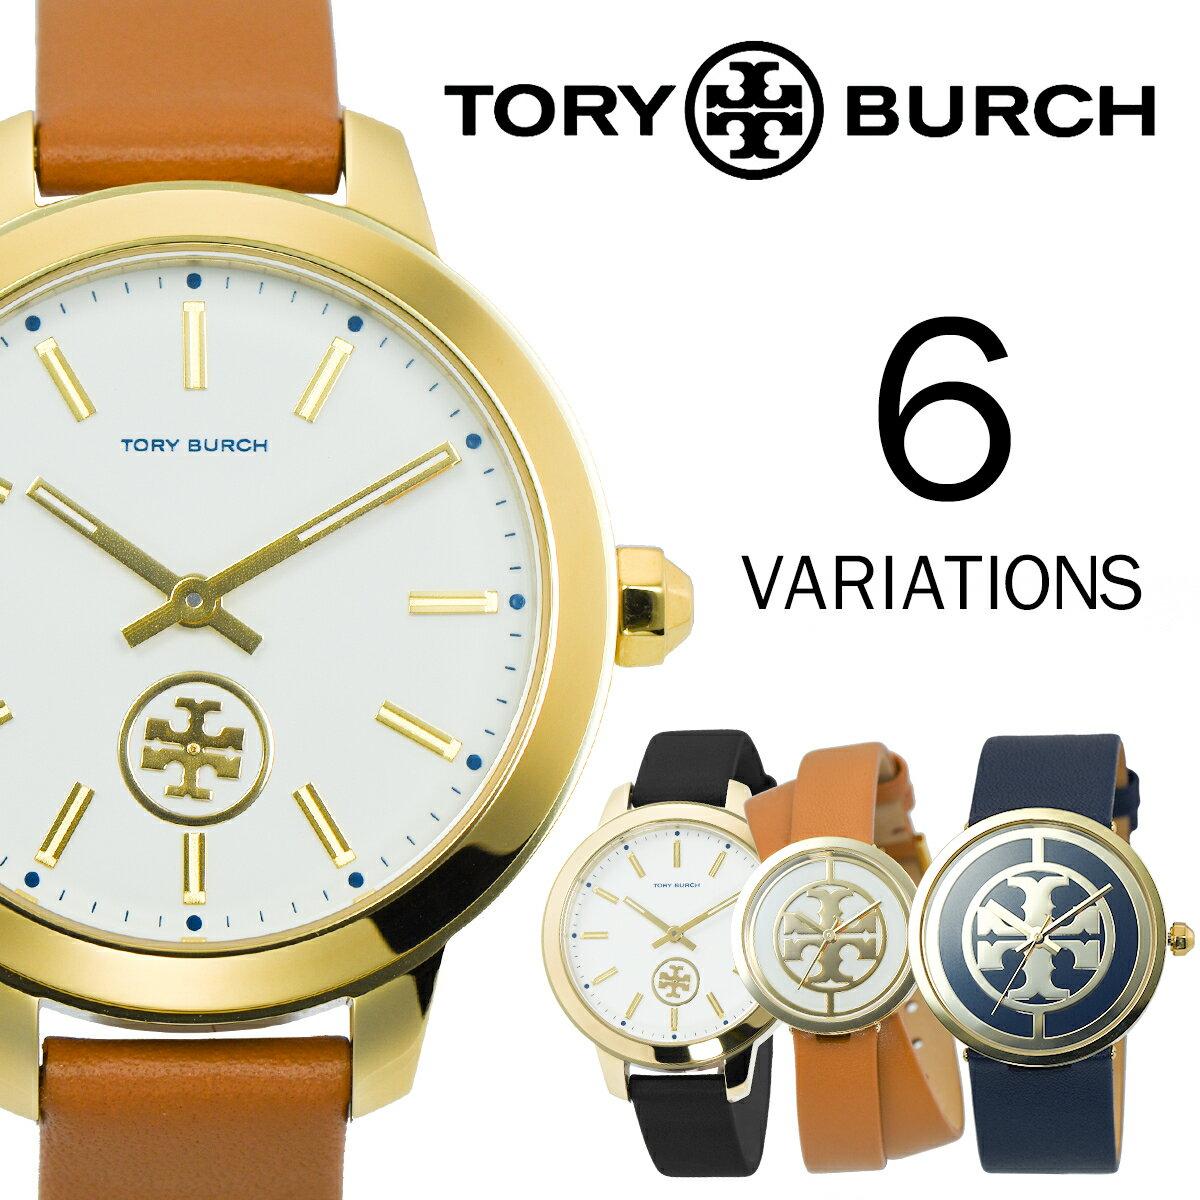 TORY BURCH トリーバーチ Collins Reva レディース 女性 時計 腕時計 プレゼント おしゃれ ギフト 贈り物 [海外正規商品][送料無料]